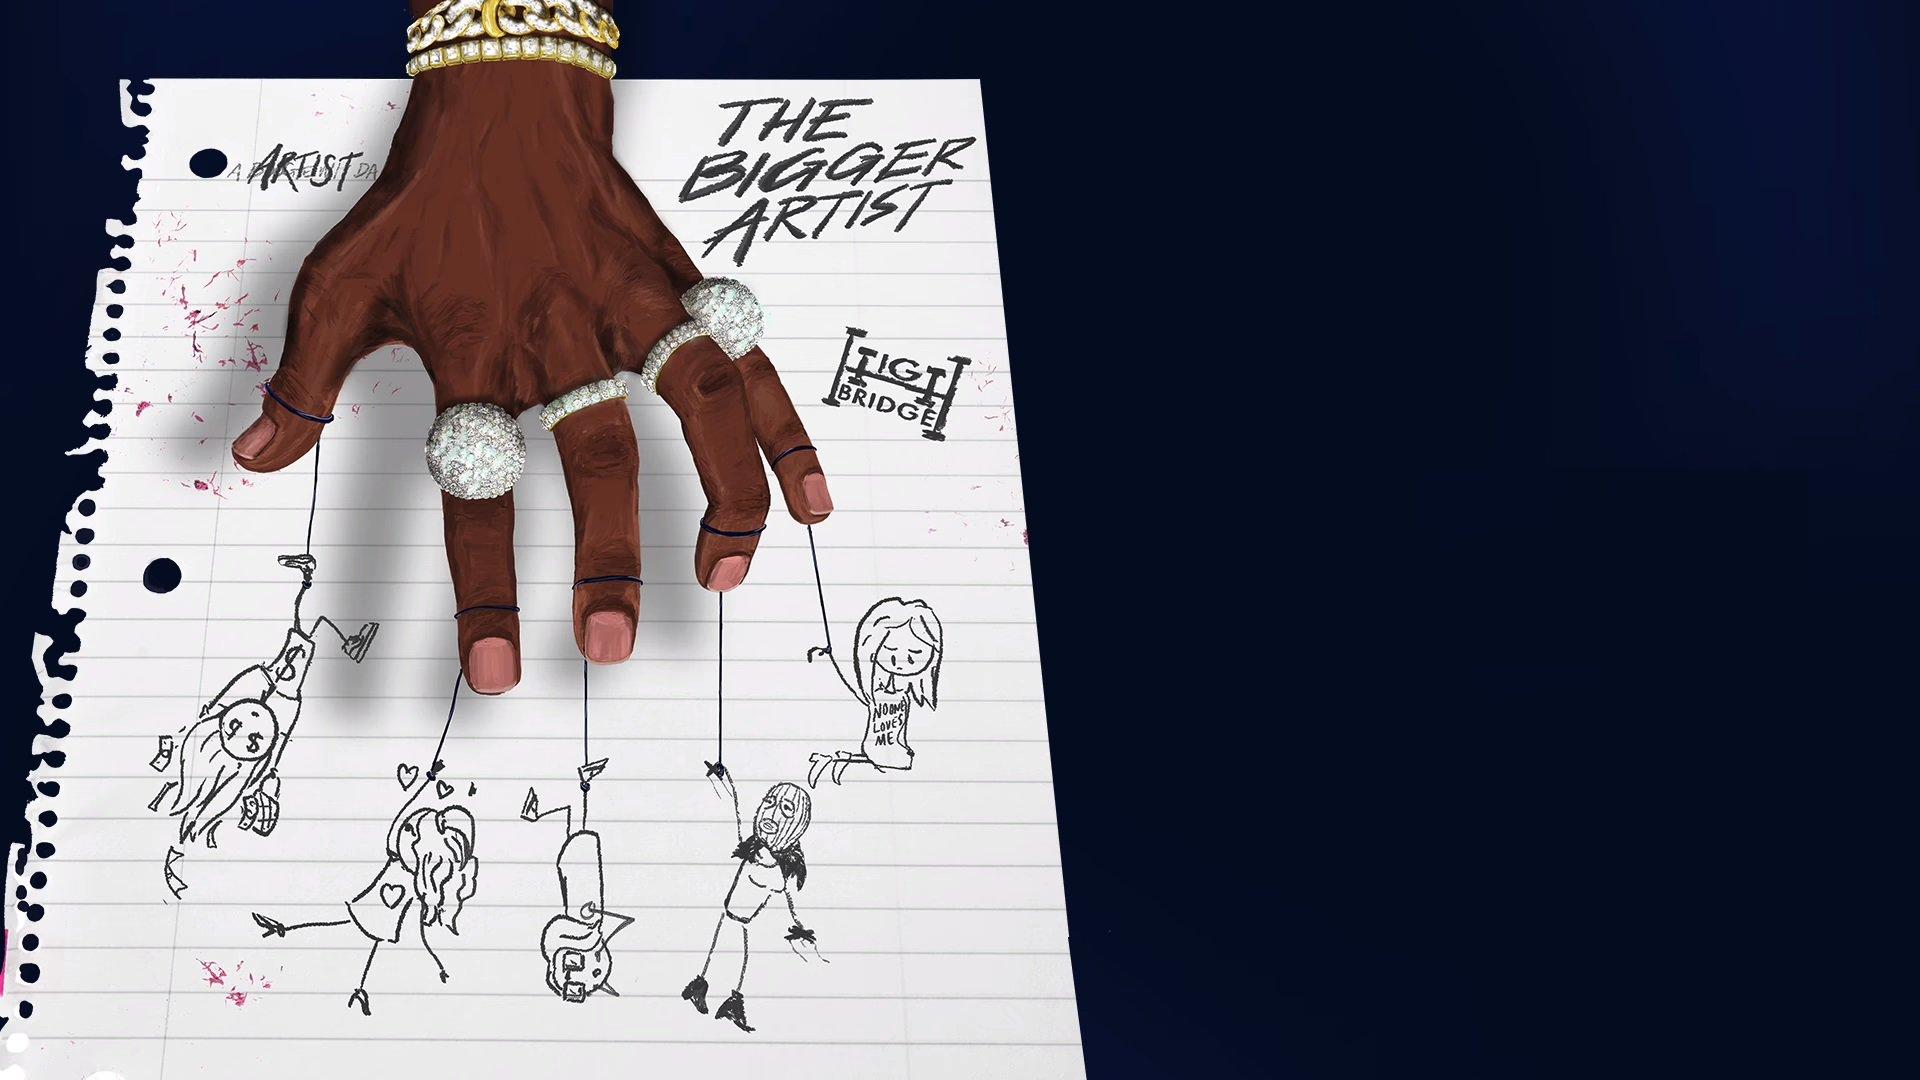 A Boogie wit da Hoodie – The Bigger Artist [Album Stream]